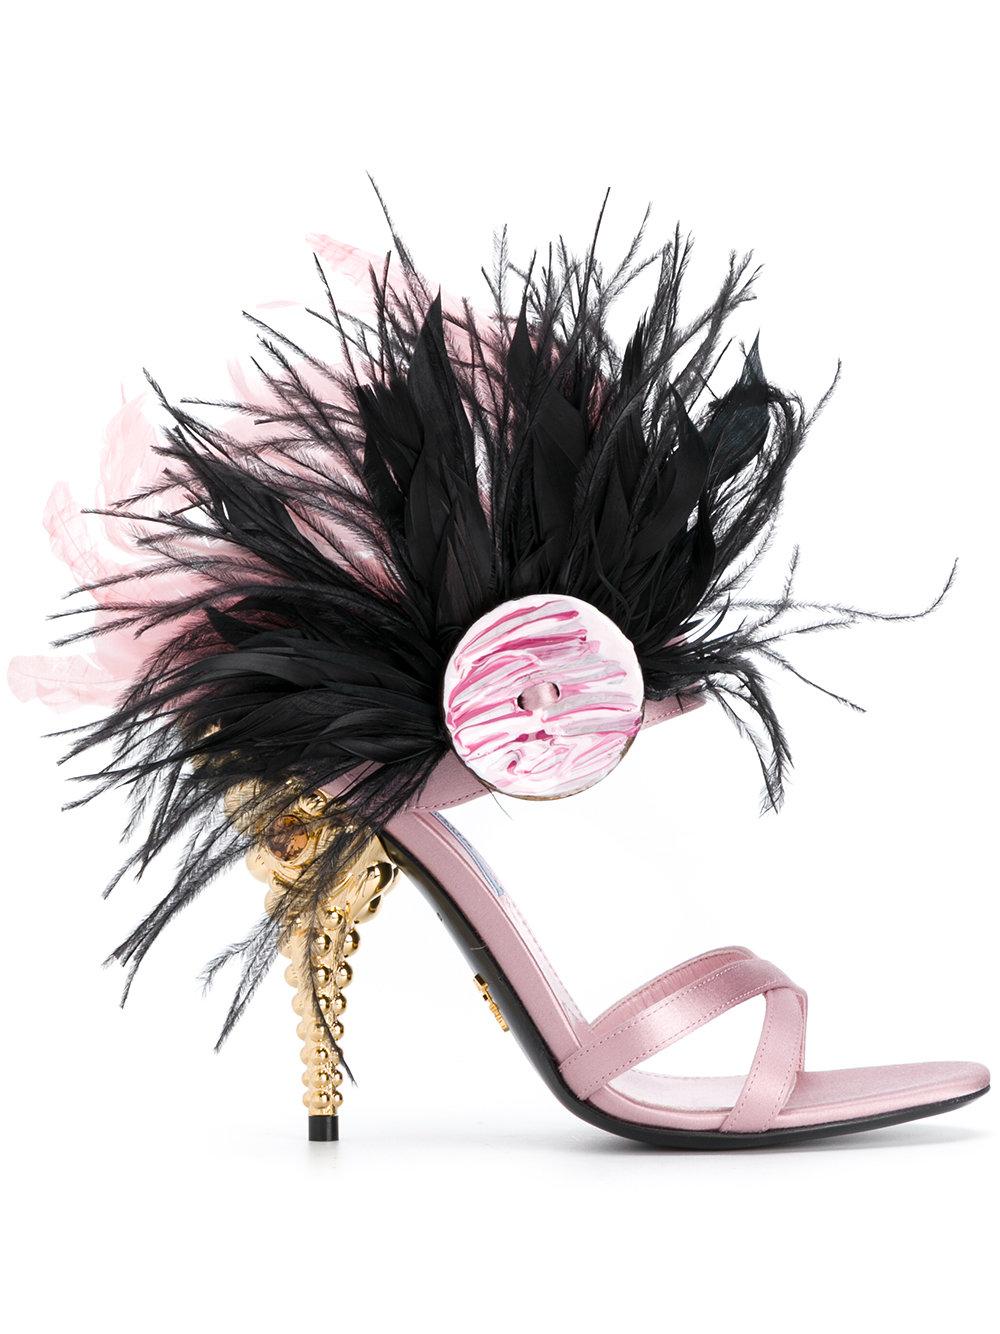 prada heels pink